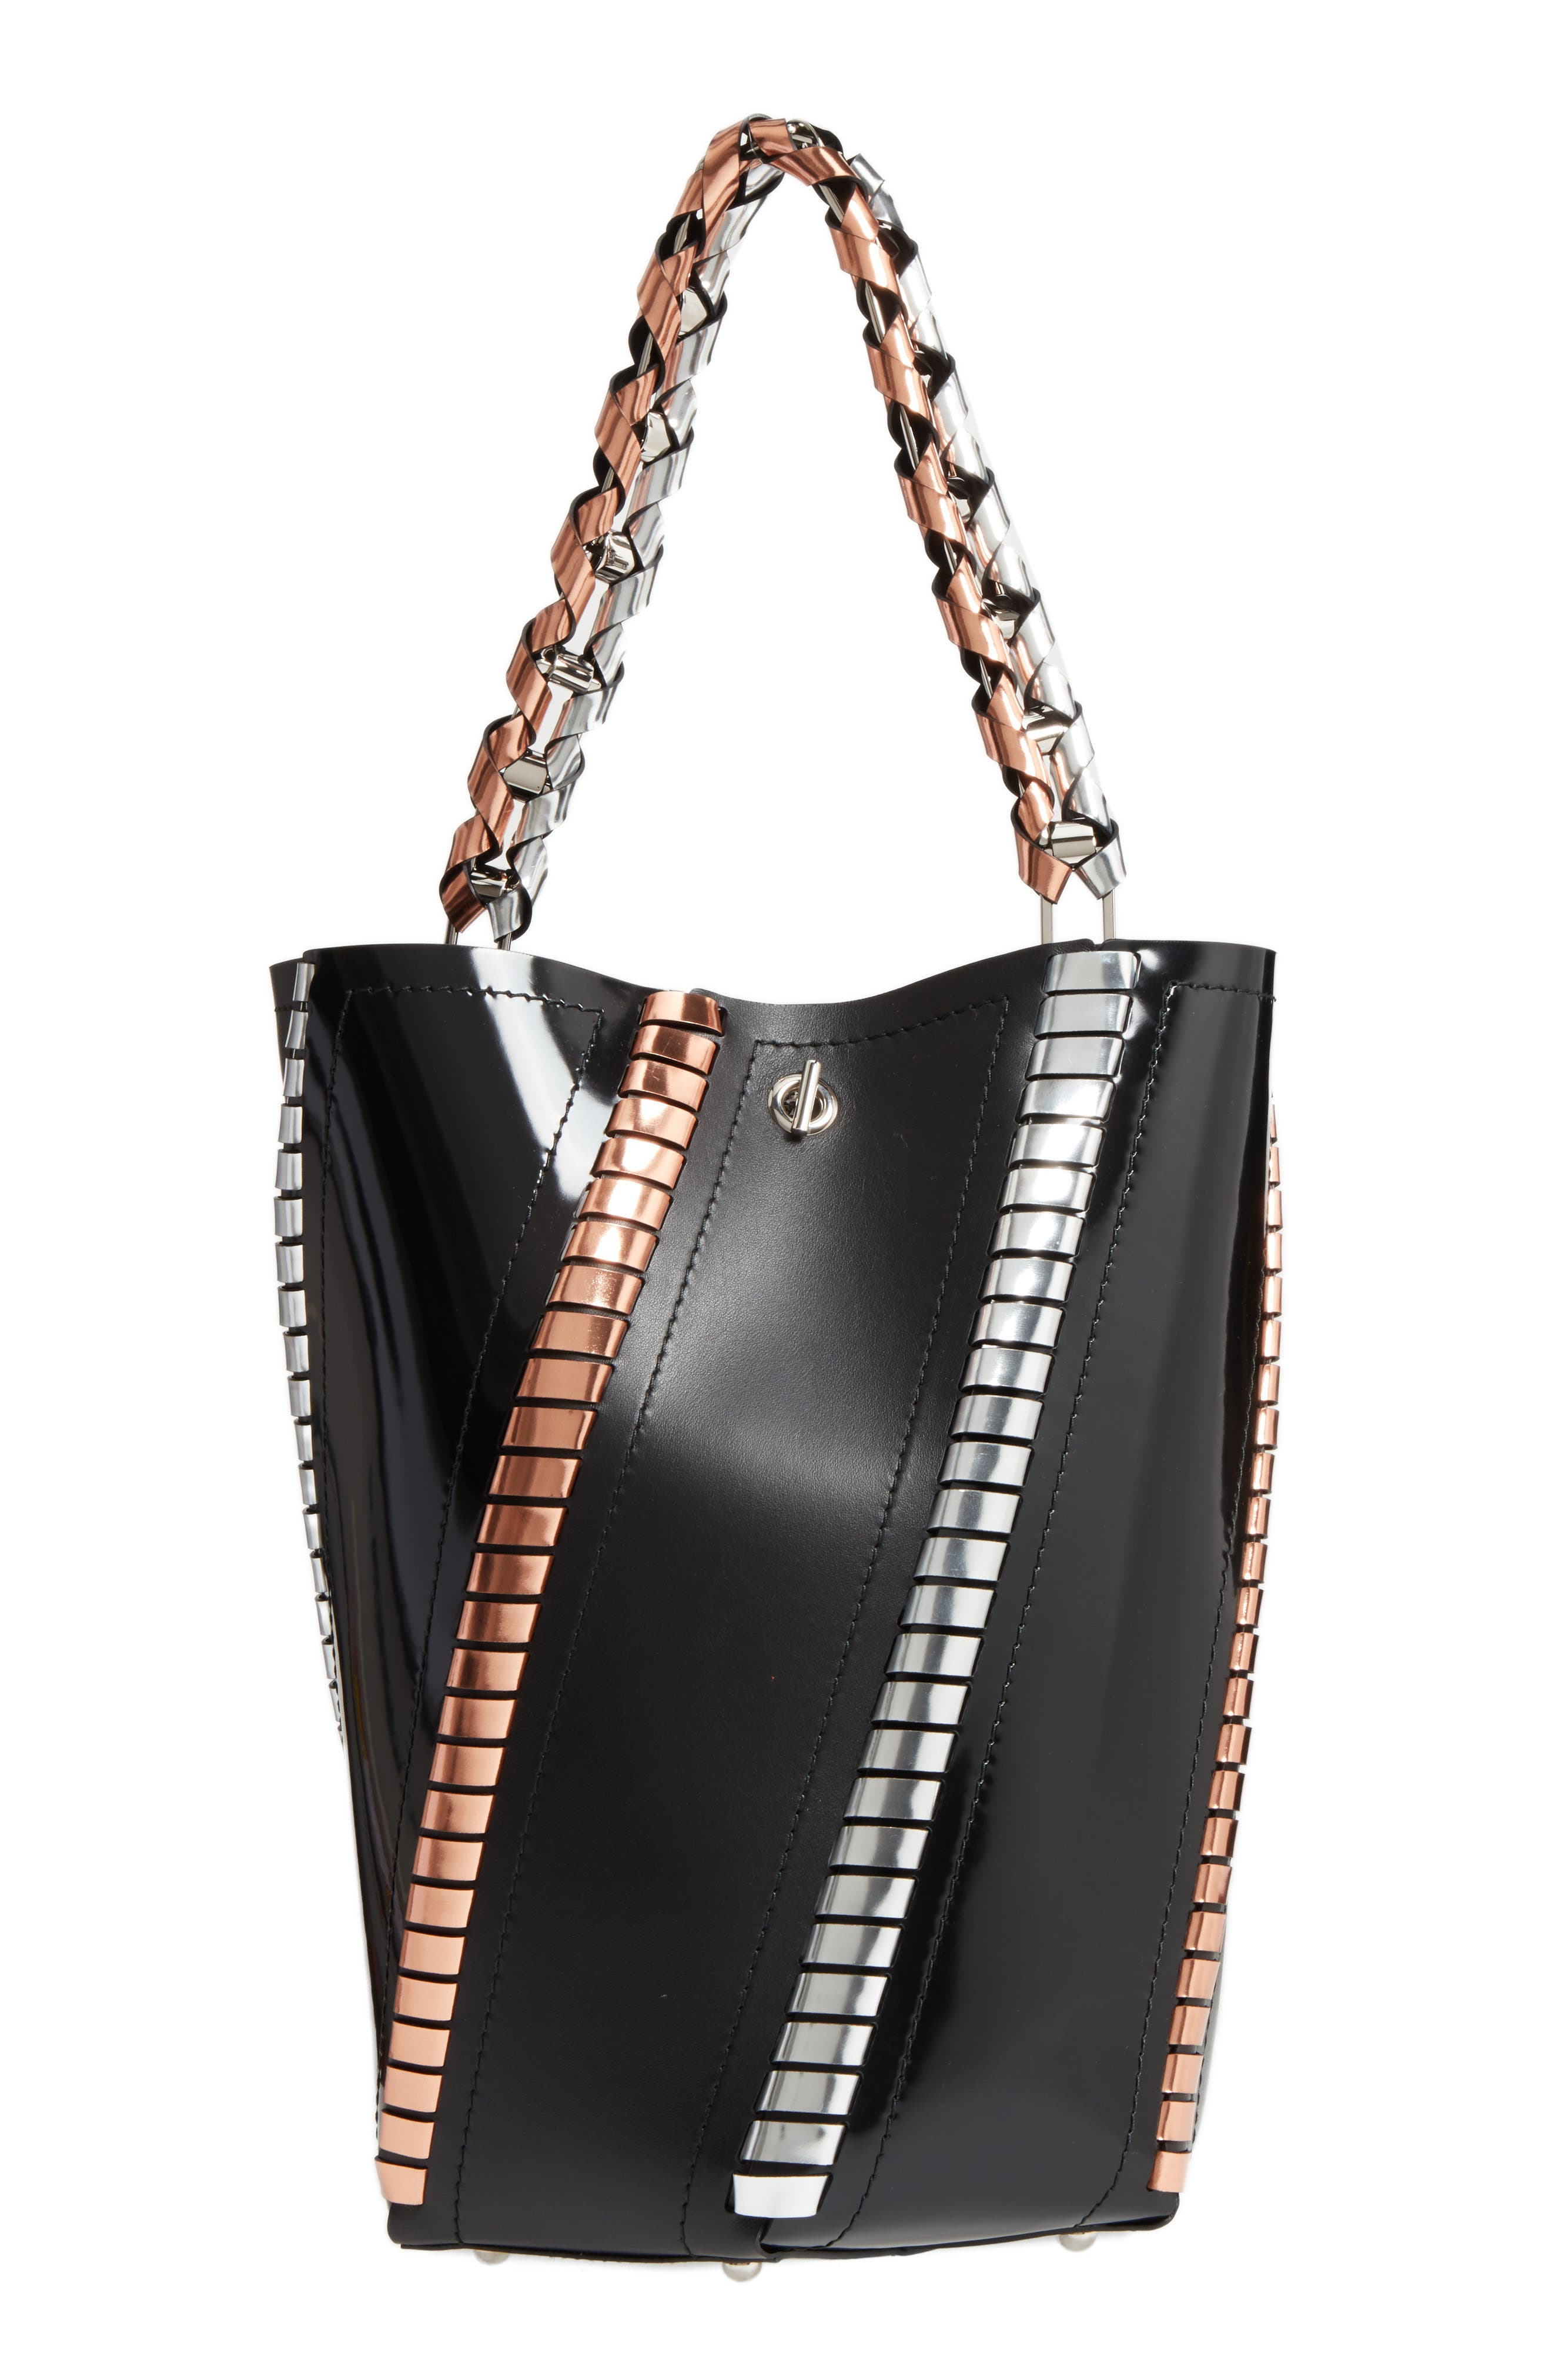 Medium Hex Metallic Whipstitch Leather Bucket Bag,                             Main thumbnail 1, color,                             Black Mix